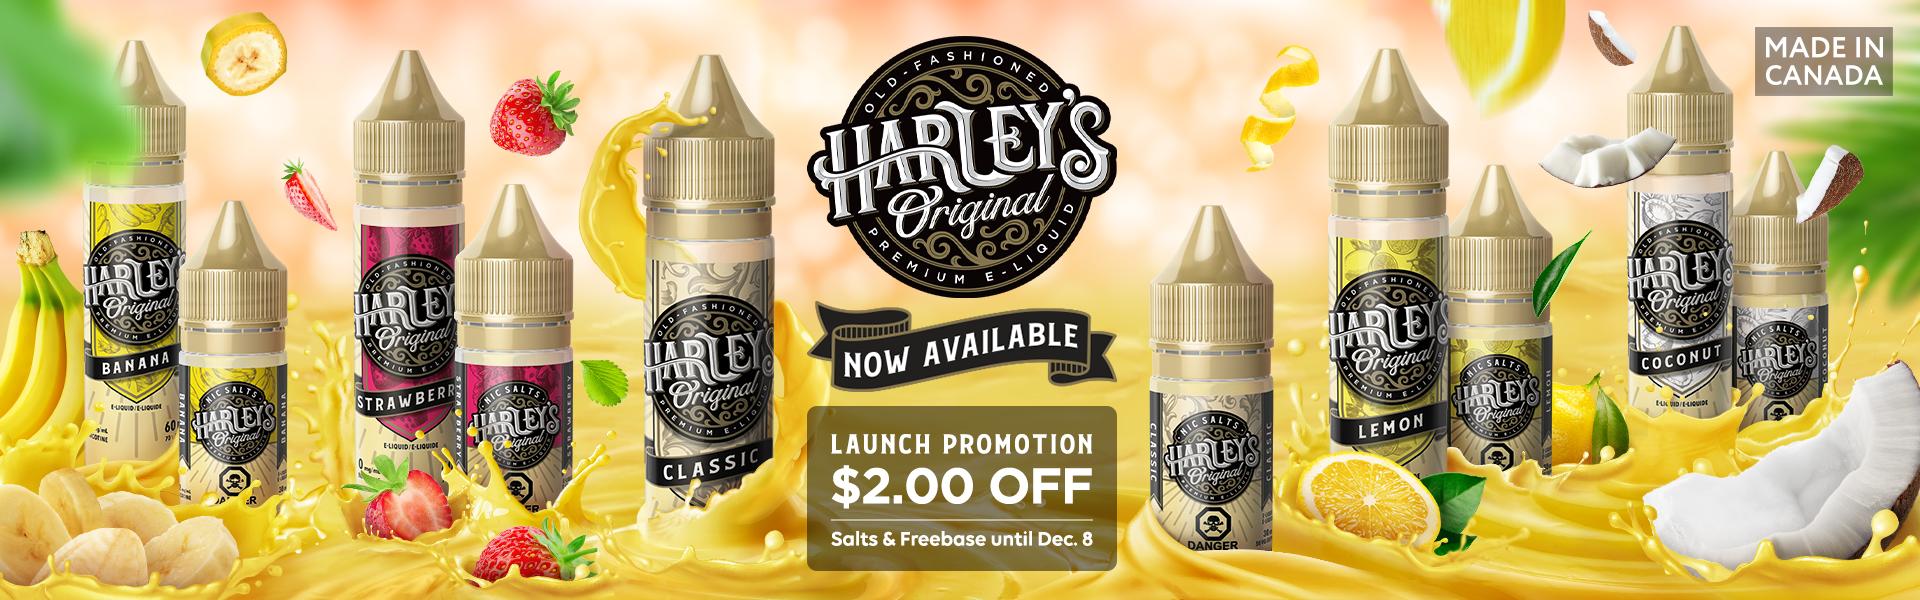 Harley's Original E-liquid Now Available